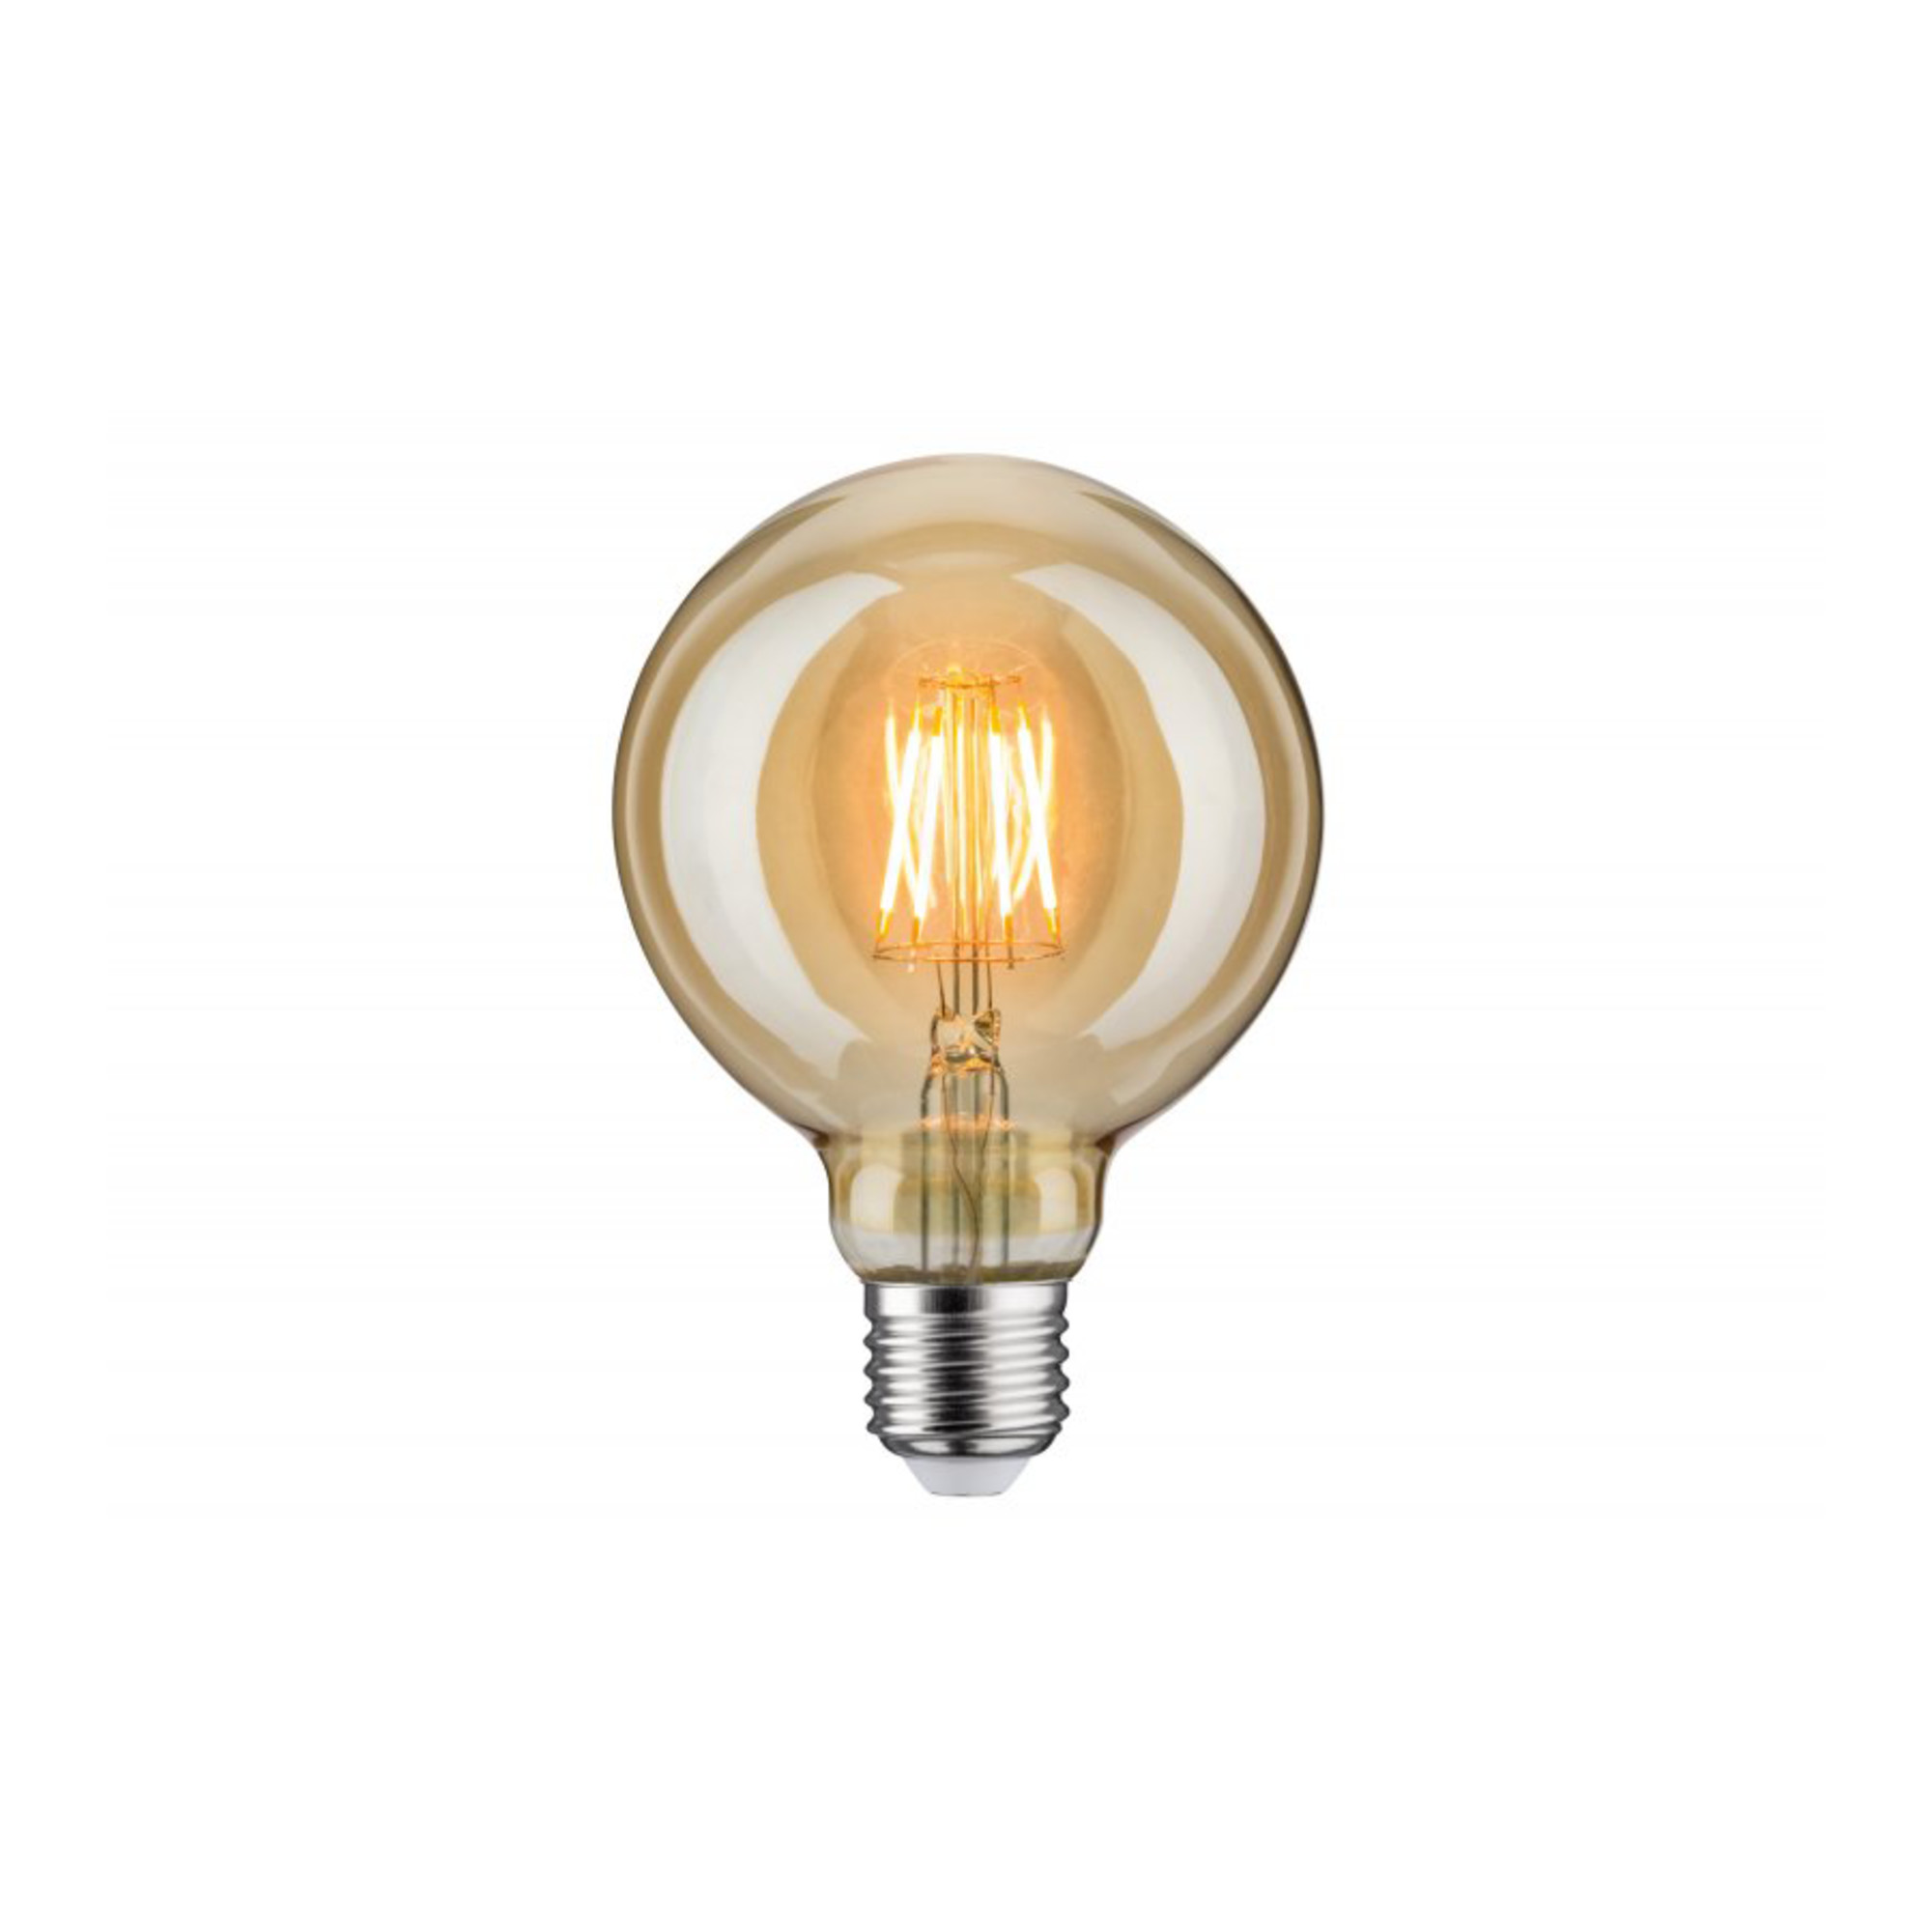 Лампа филаментная Paulmann Vintage Шар G95 6.5Вт 400лм 1700К Е27 230В Золото 28400.